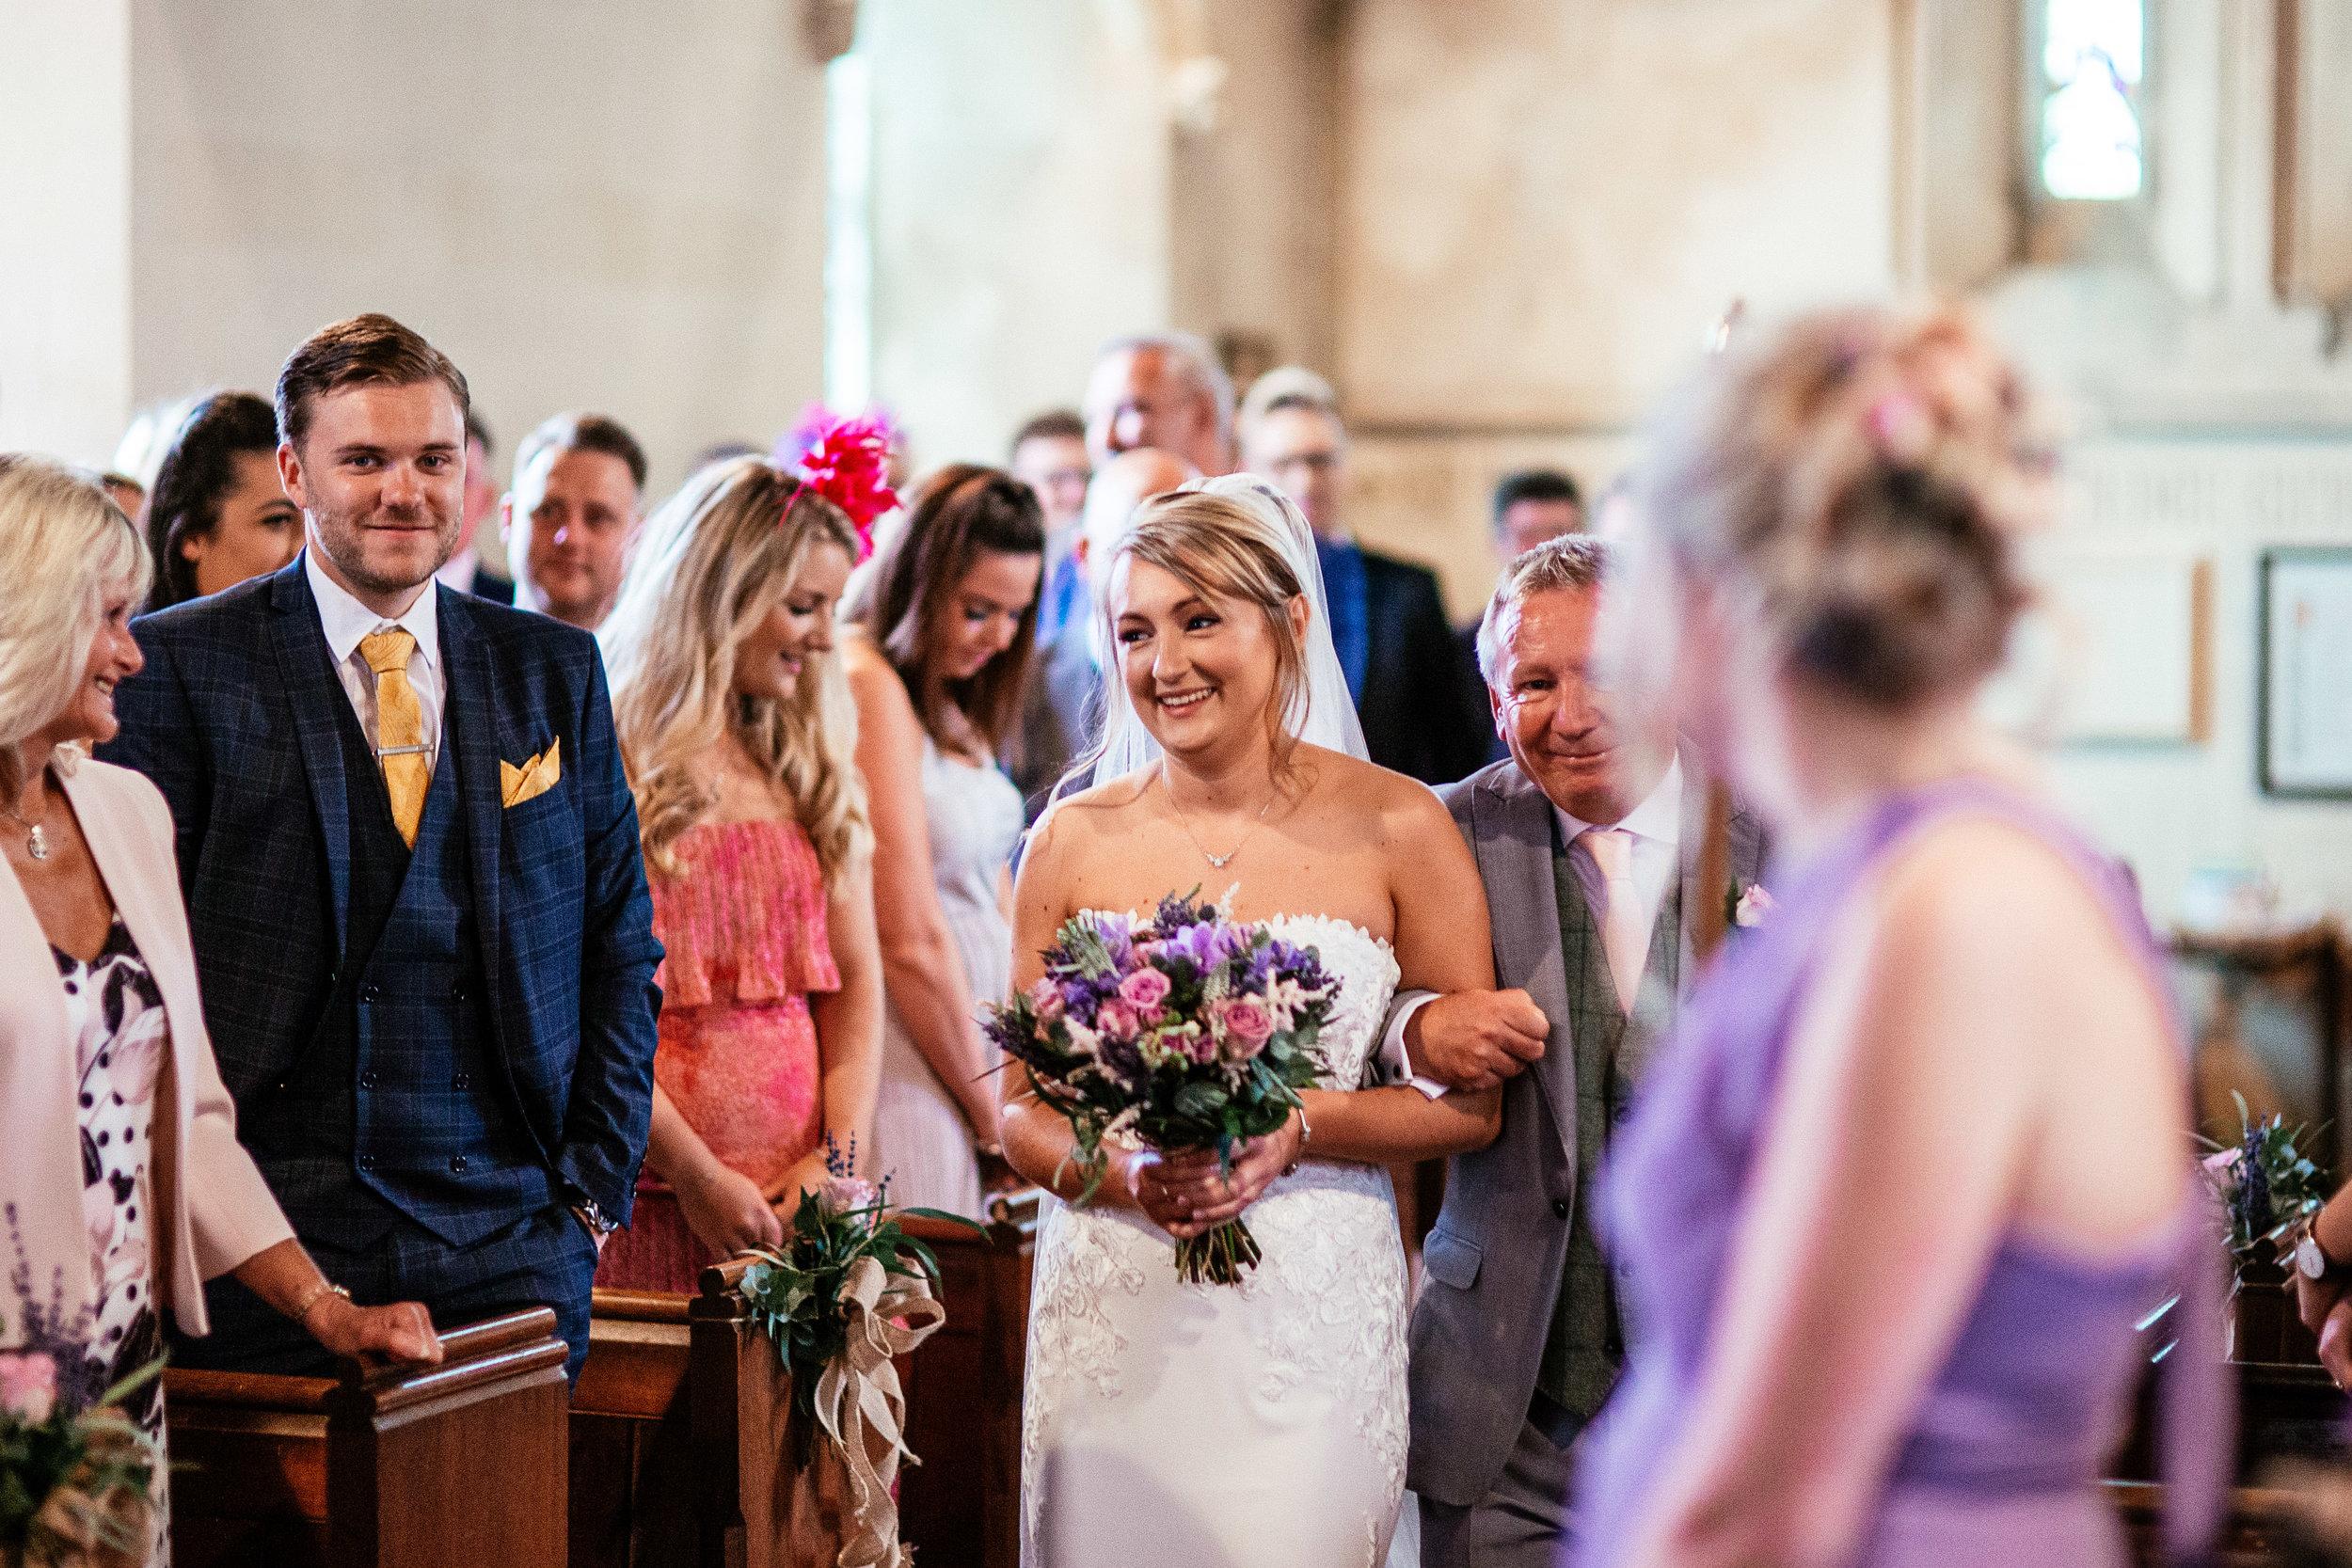 Becky-and-Sam-Wedding-Highlights-16.jpg